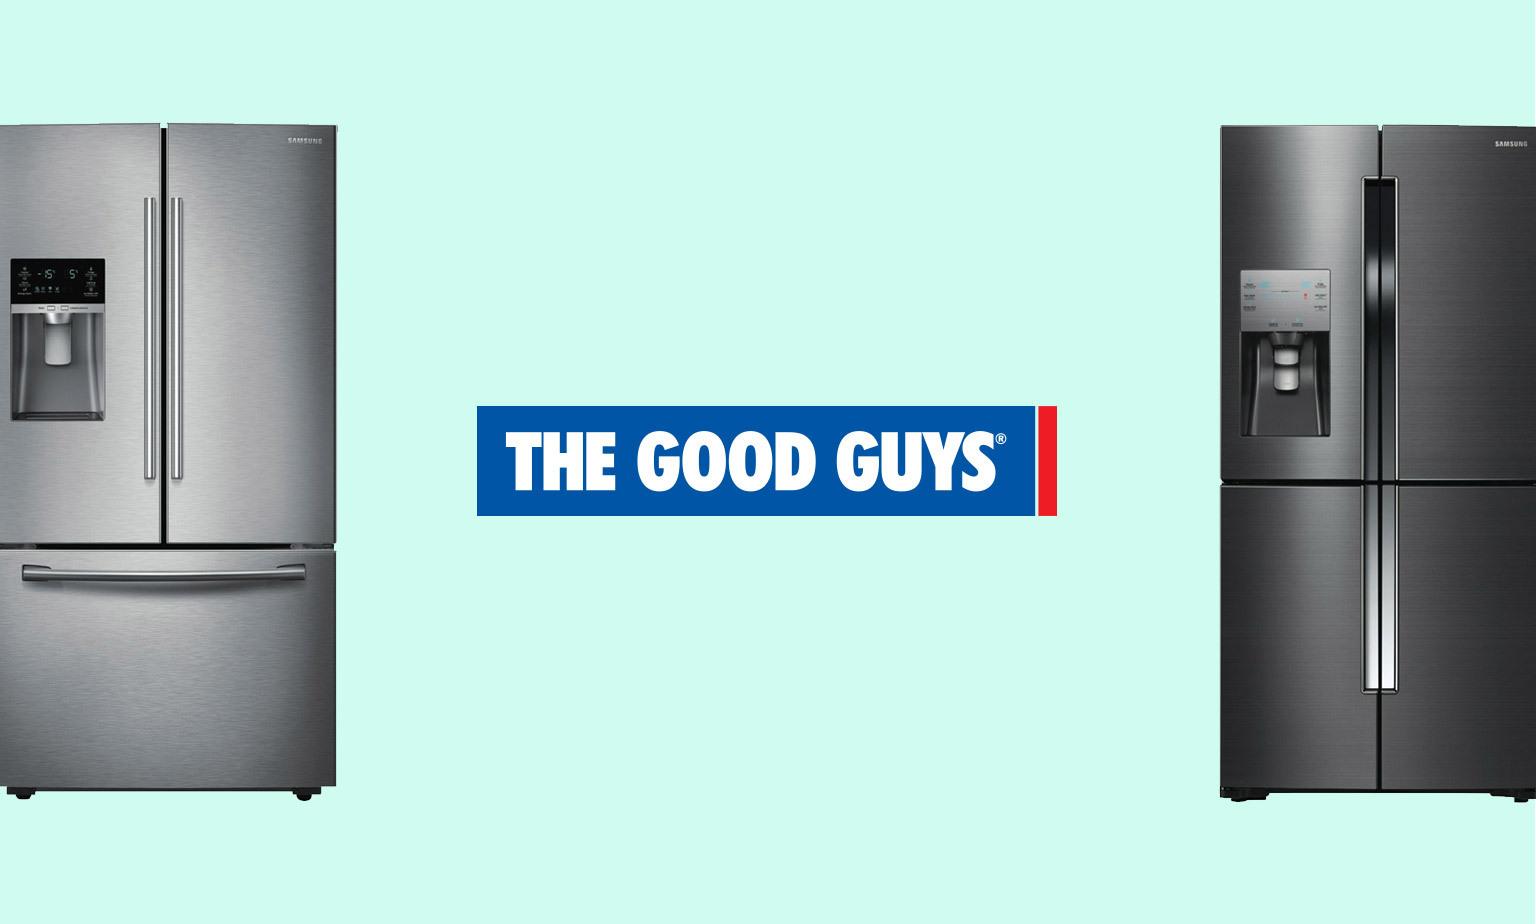 The Good Guys Fridge Sale